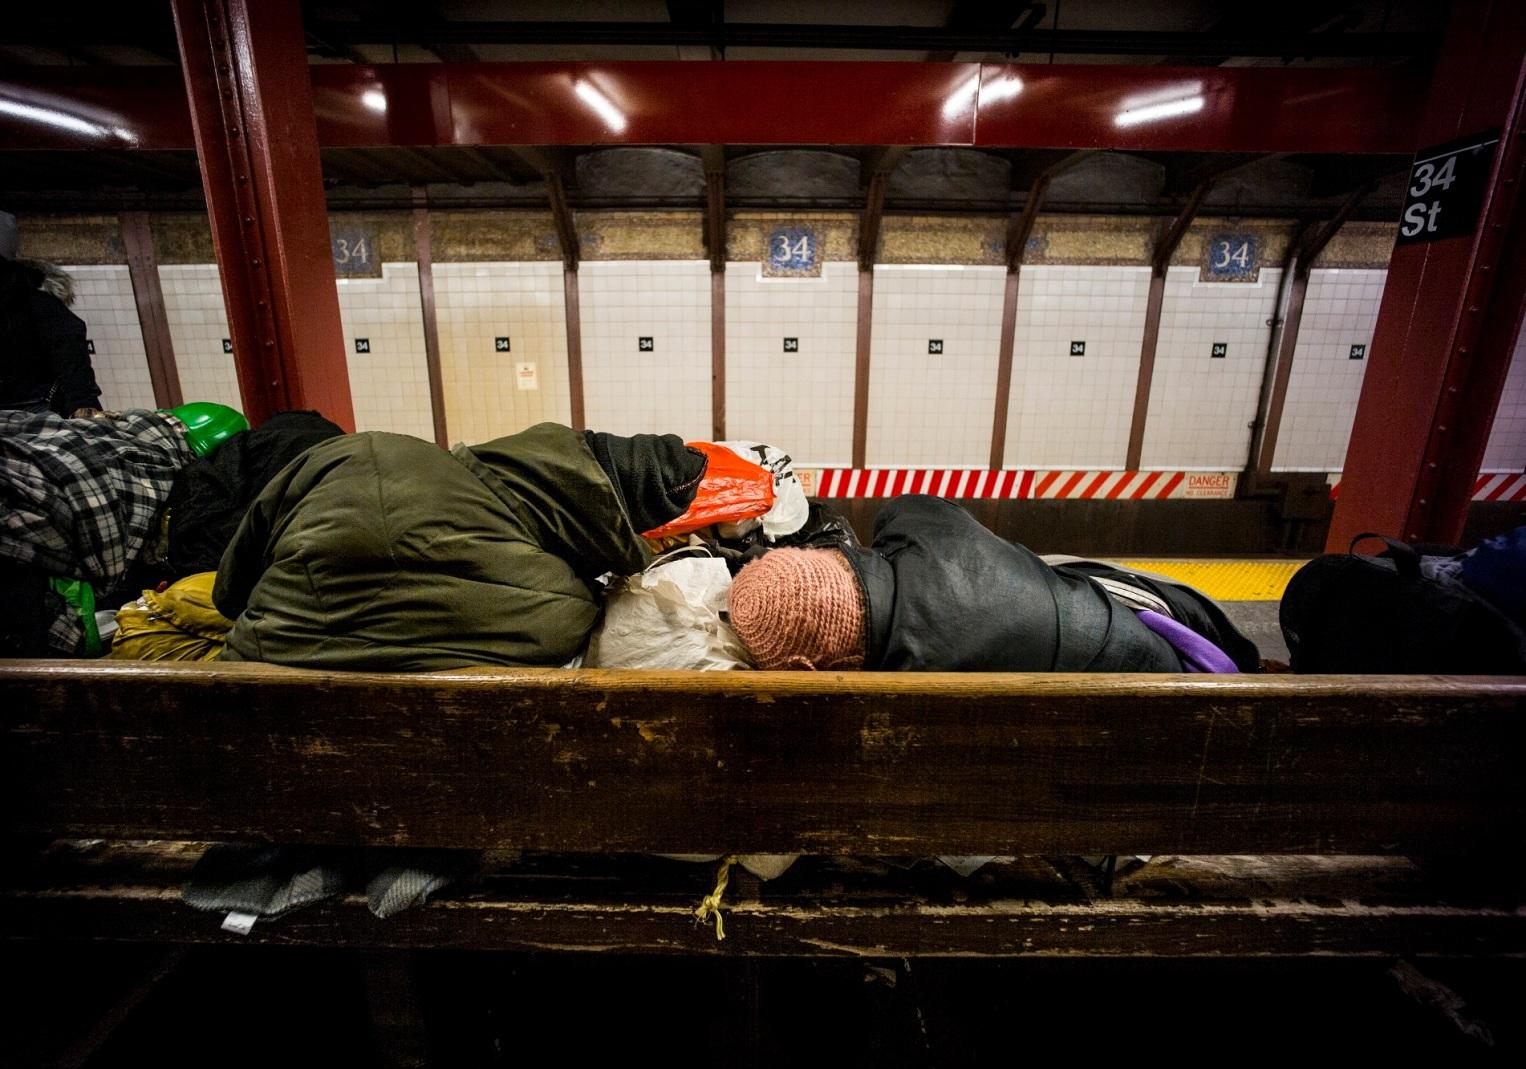 homeless-sleeping-on-bench-subway-nyc-2016-daniel-d-teoli-jr